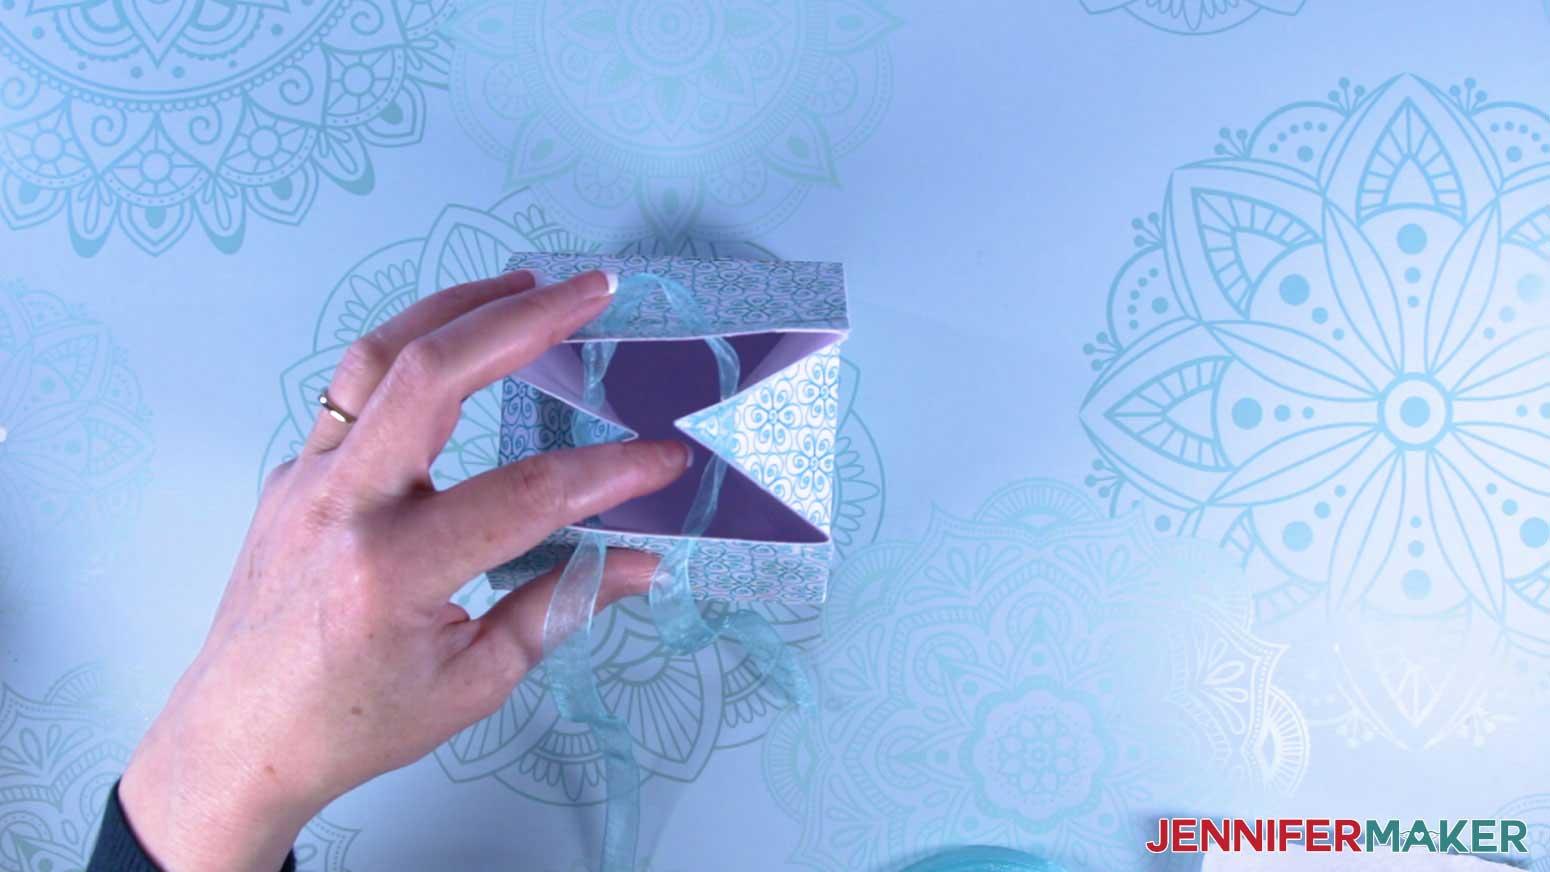 Thread ribbon through the holes of the milk carton mug gift boxes